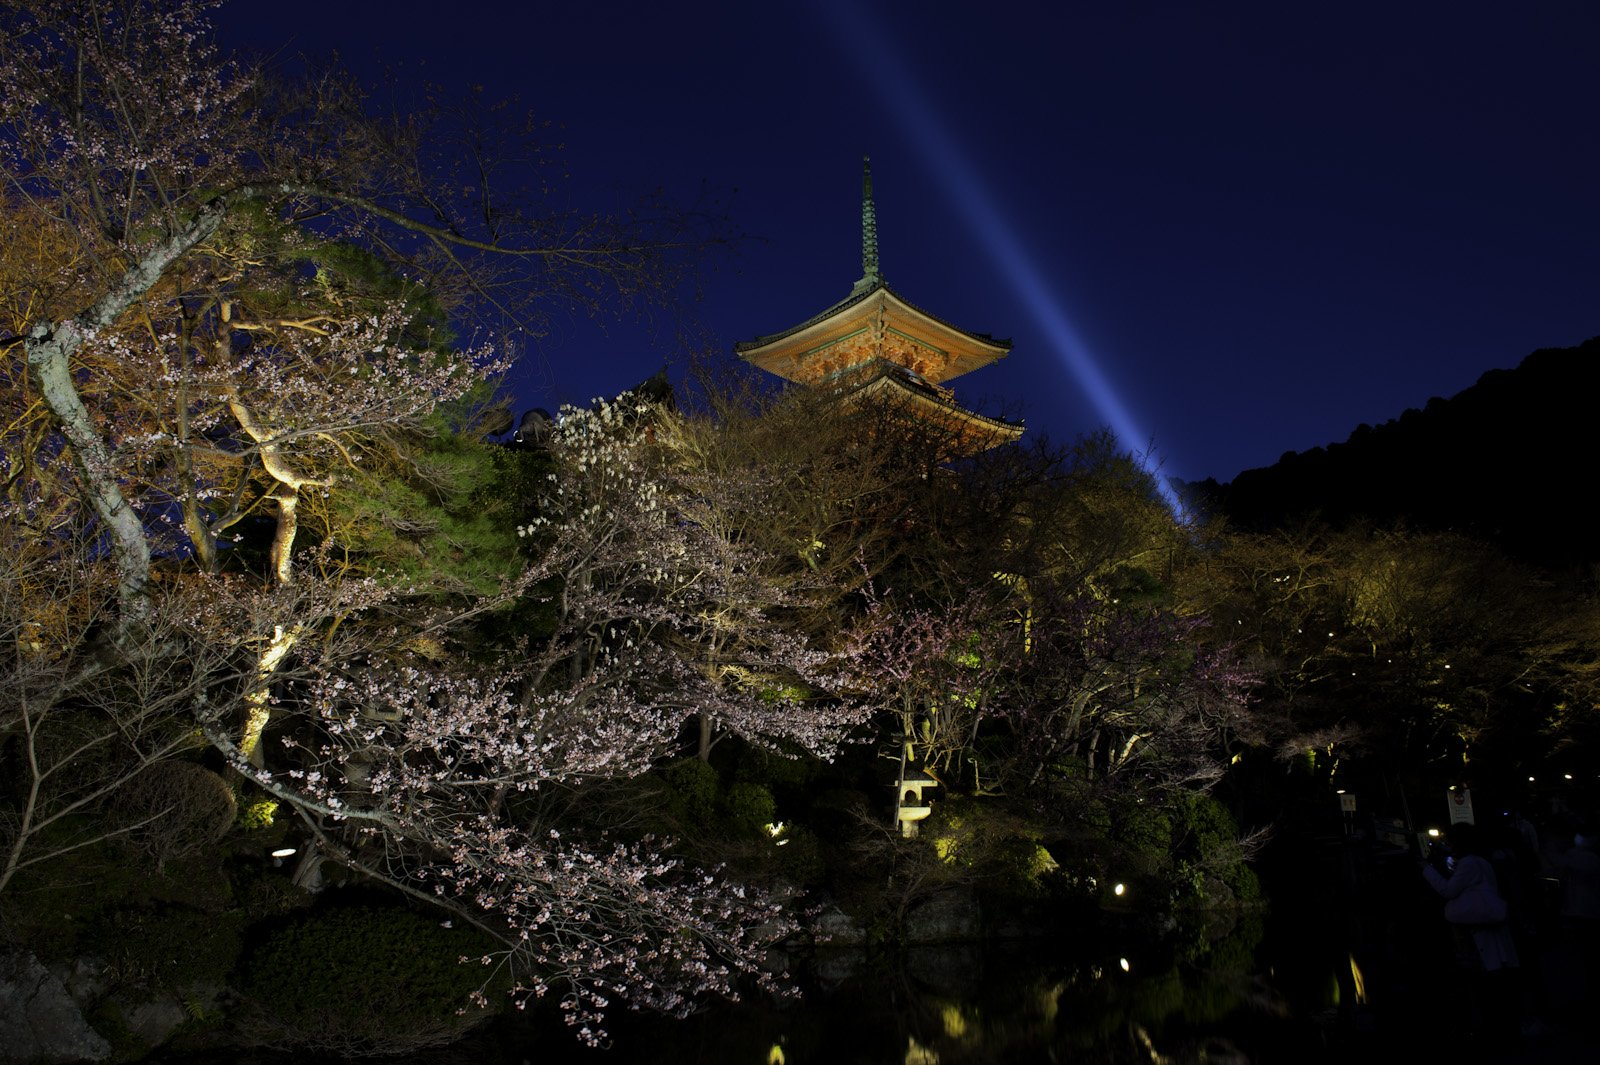 Hanami (flower viewing), Sakura (Cherry Blossom Festival), Kiyomizu-Dera Temple, Kyoto, Japan